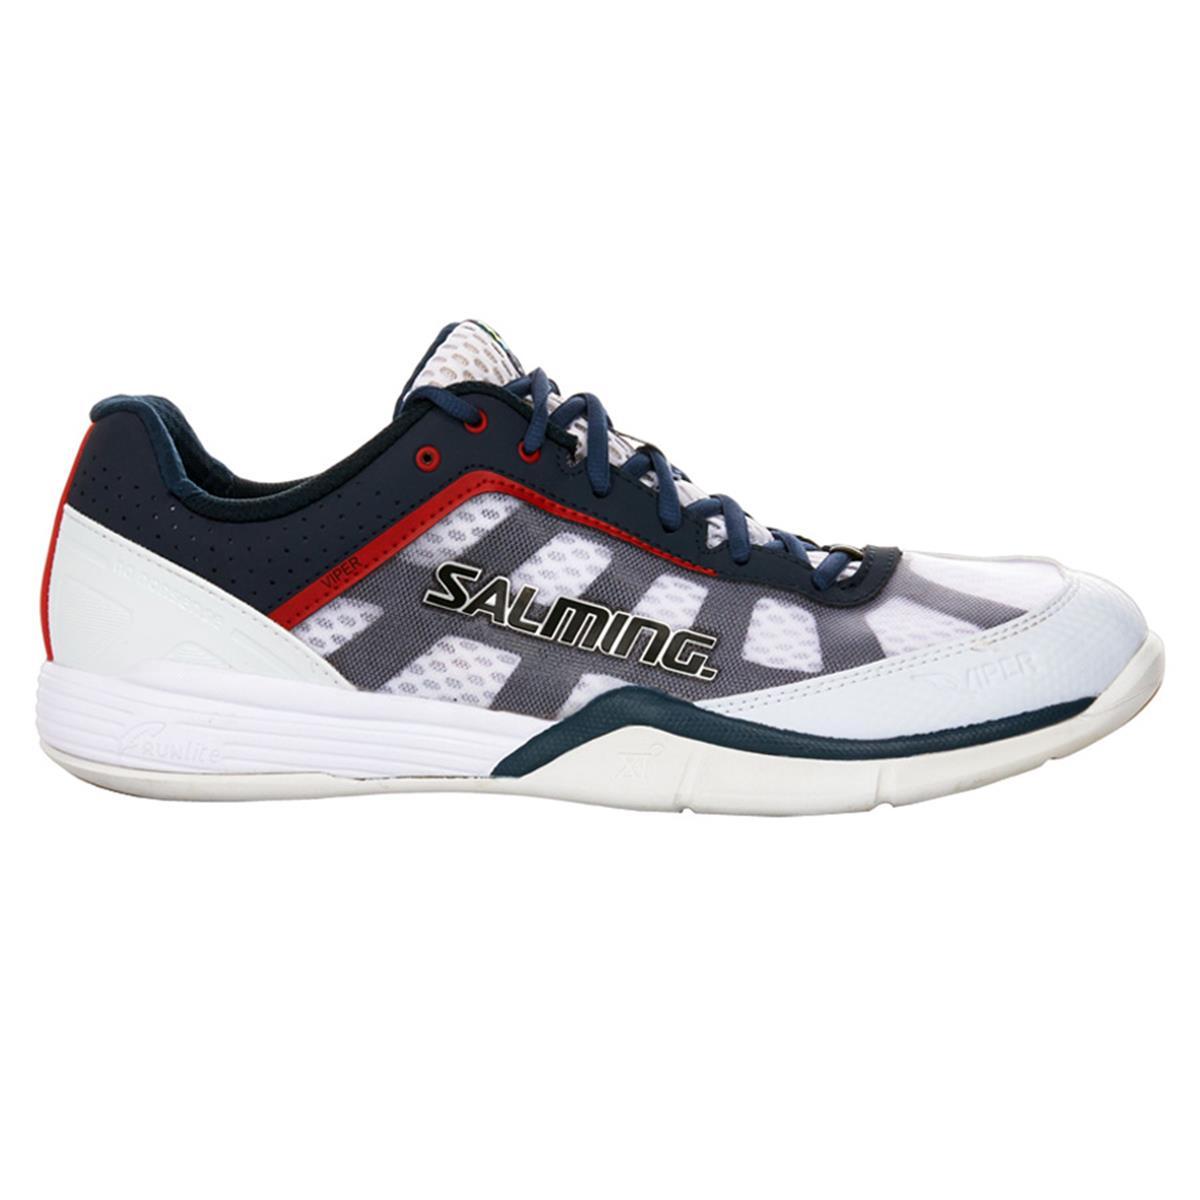 Mens Shoes Buy  Get